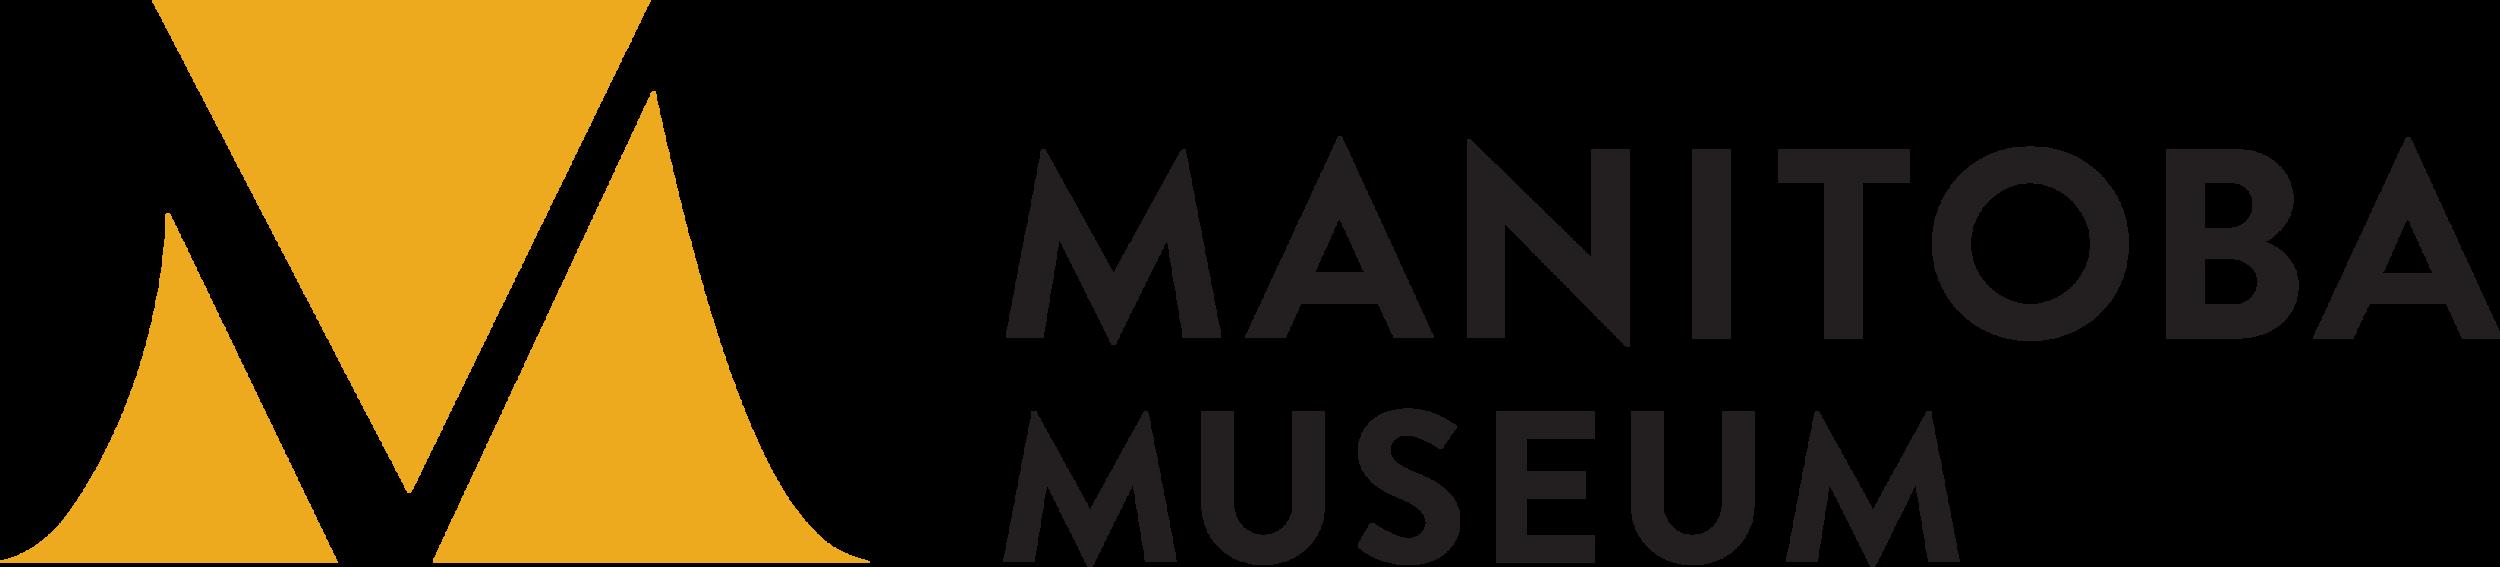 manitoba-museum.png